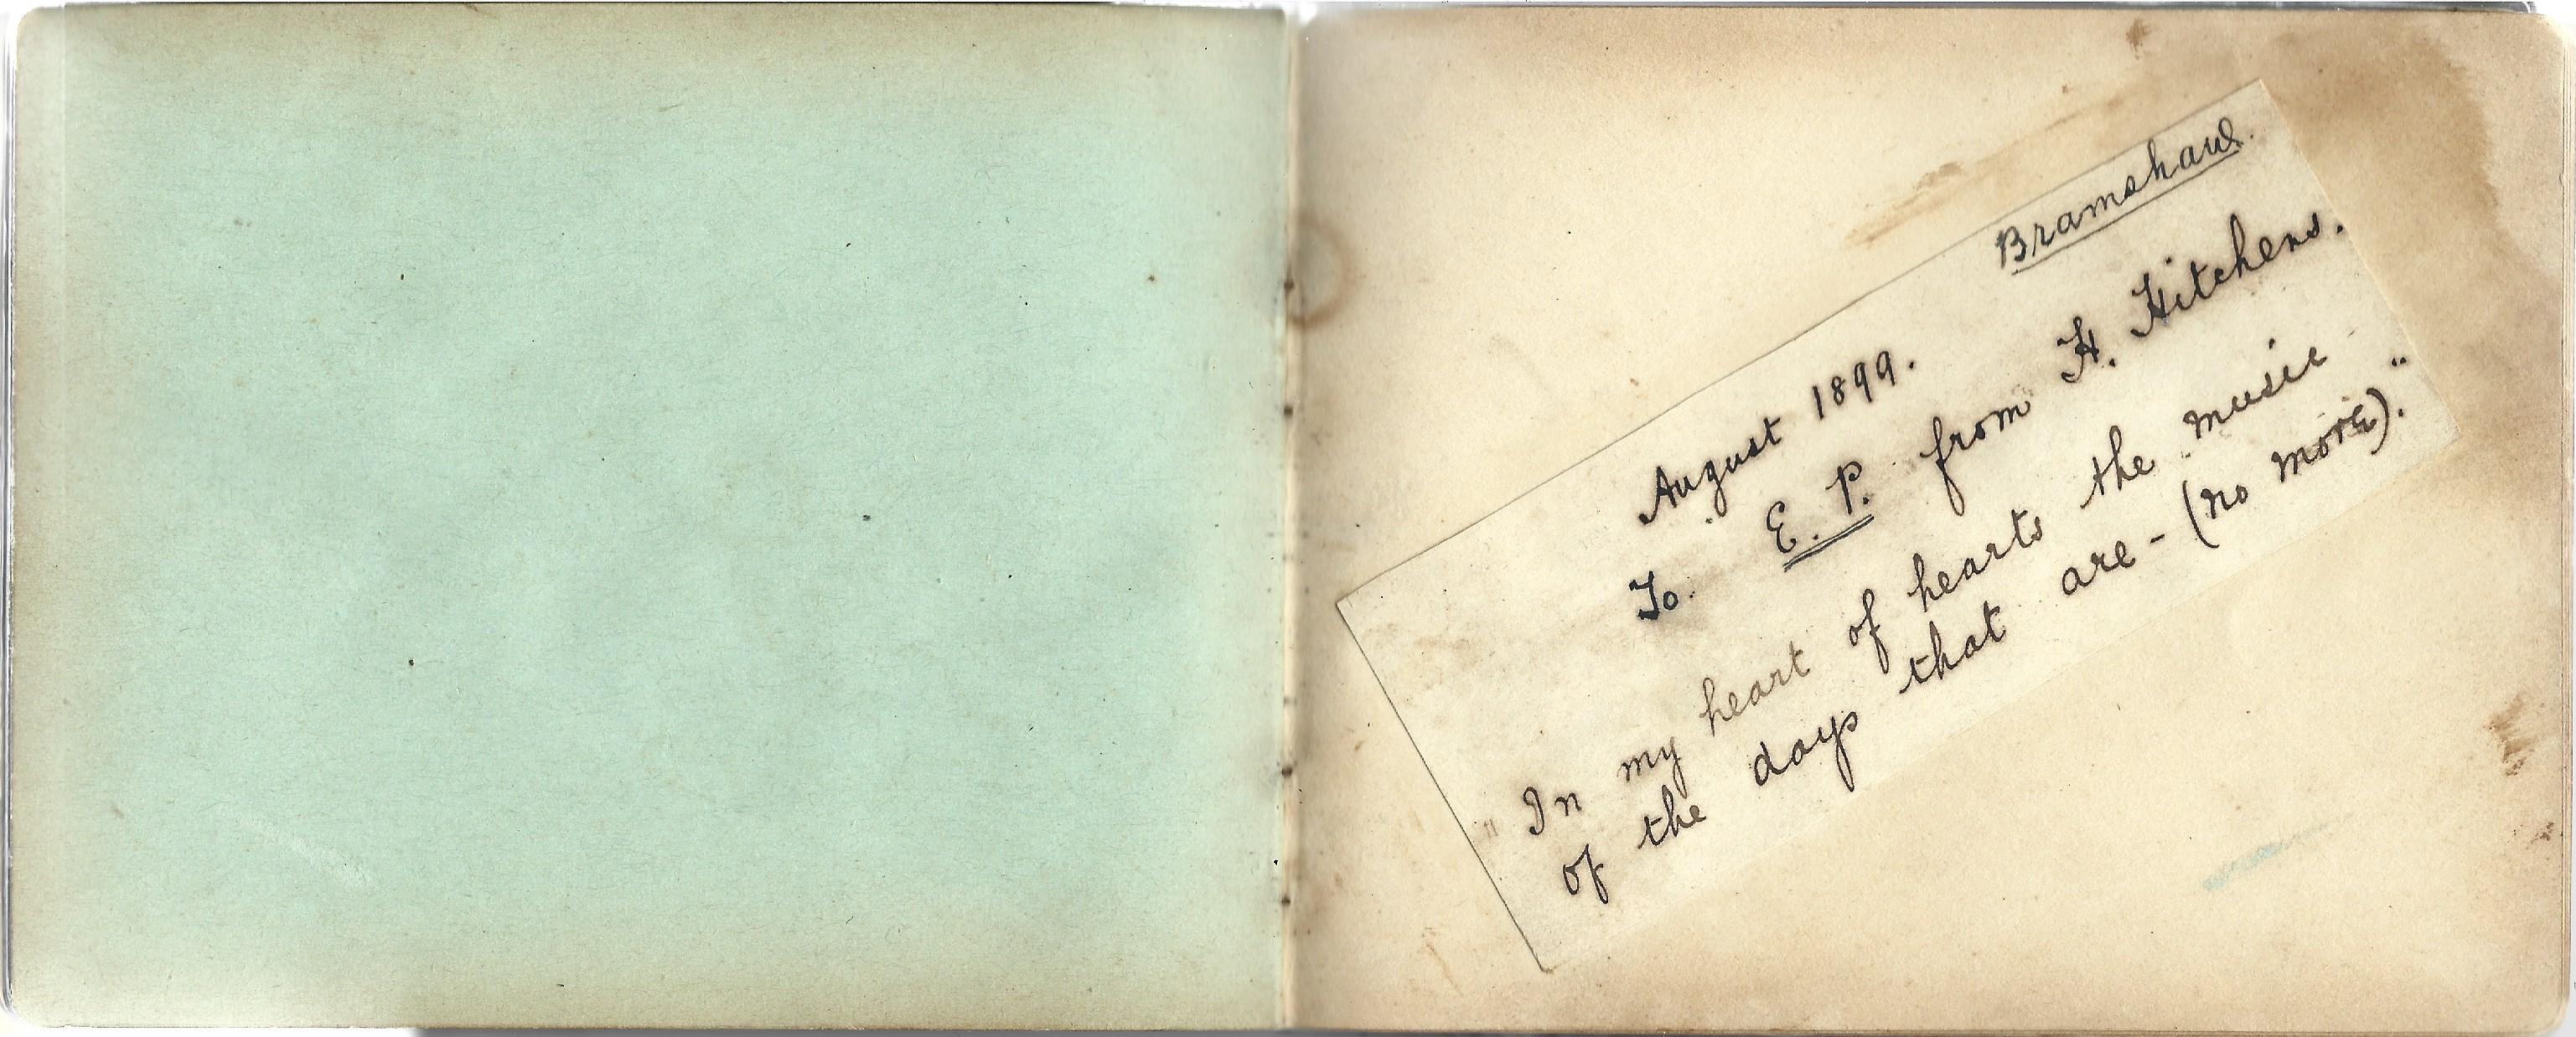 A World War 1 era autograph album, mostly comprising poignant poems and verses, a few original - Image 4 of 8